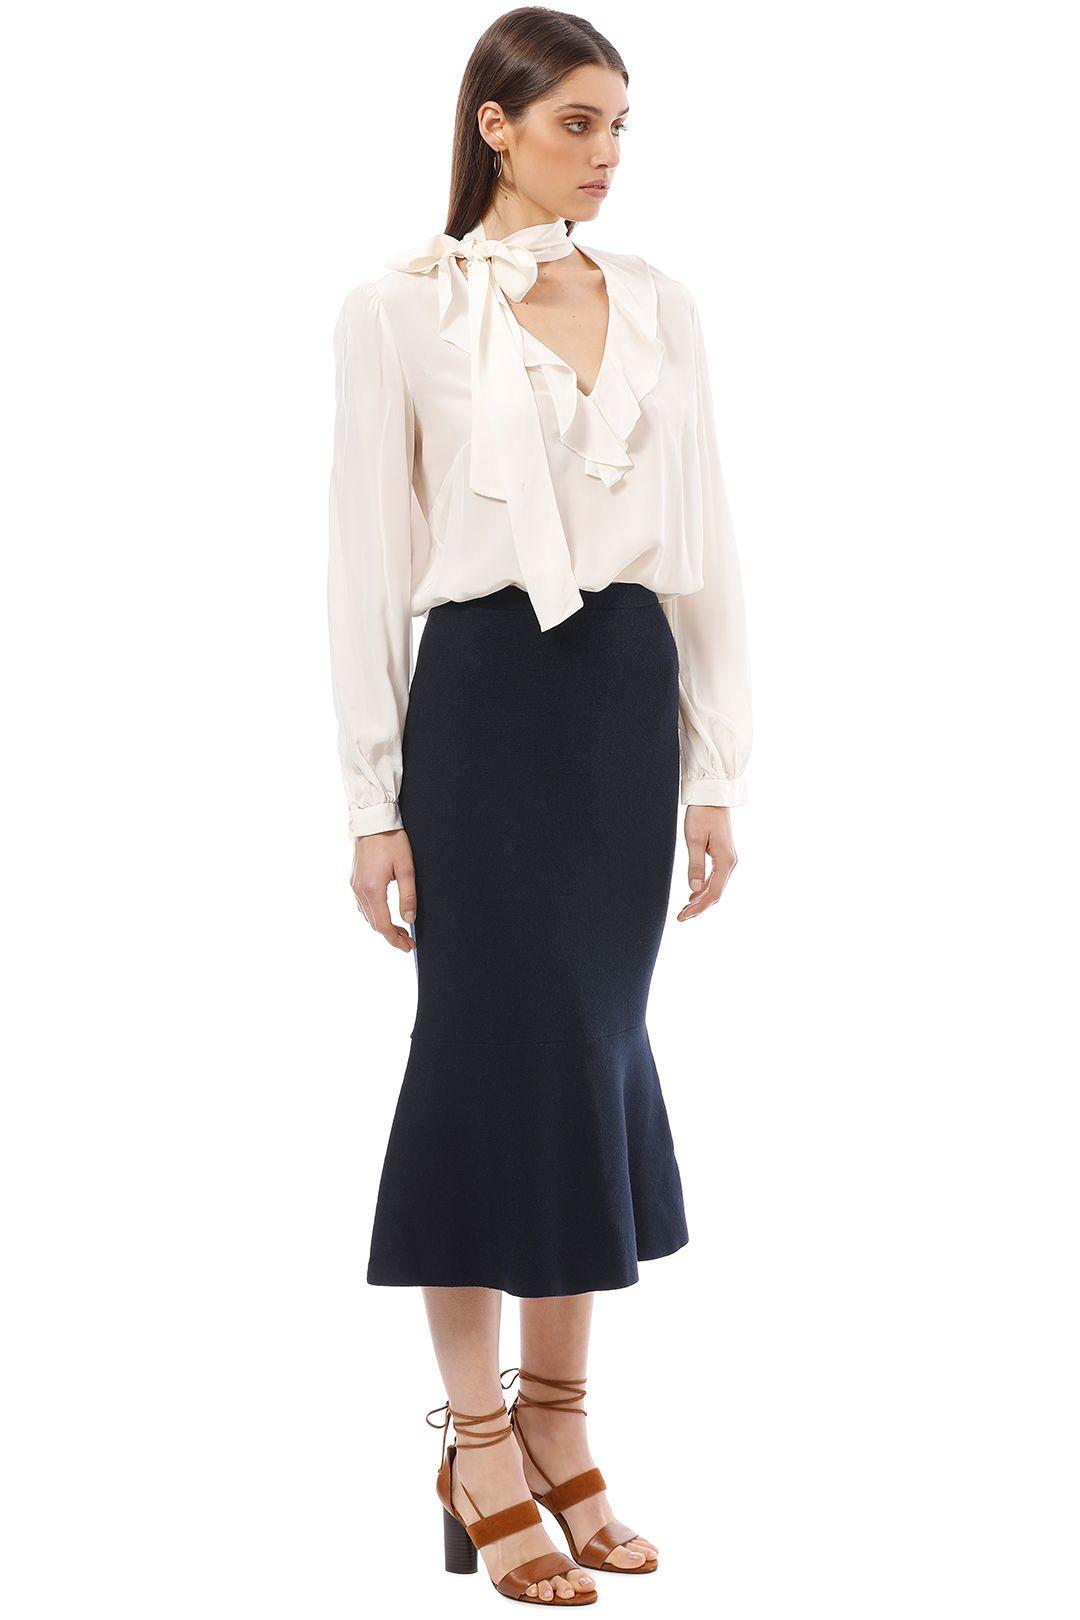 Friend of Audrey - Eleanor Midi Skirt - Navy - Side